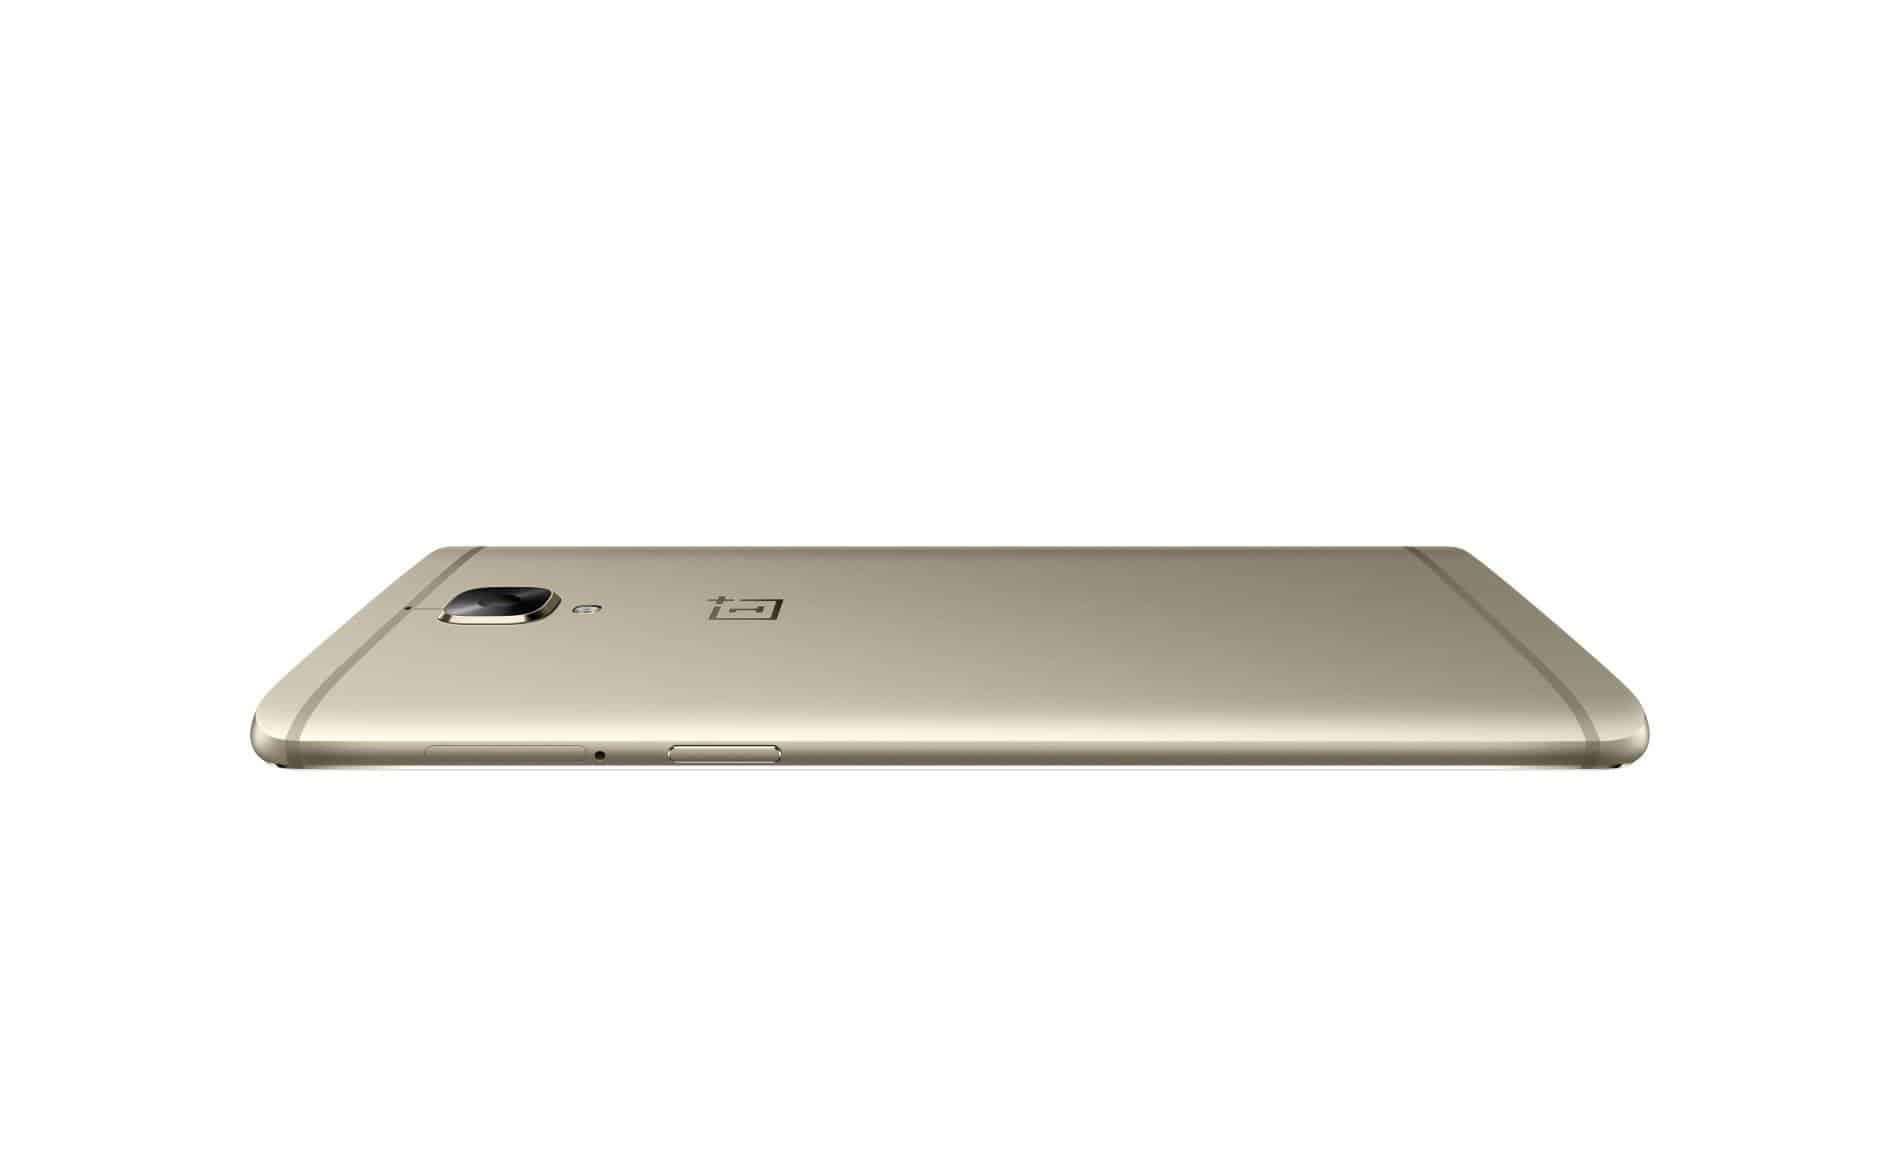 OnePlus 3 Soft Gold Press AH 22